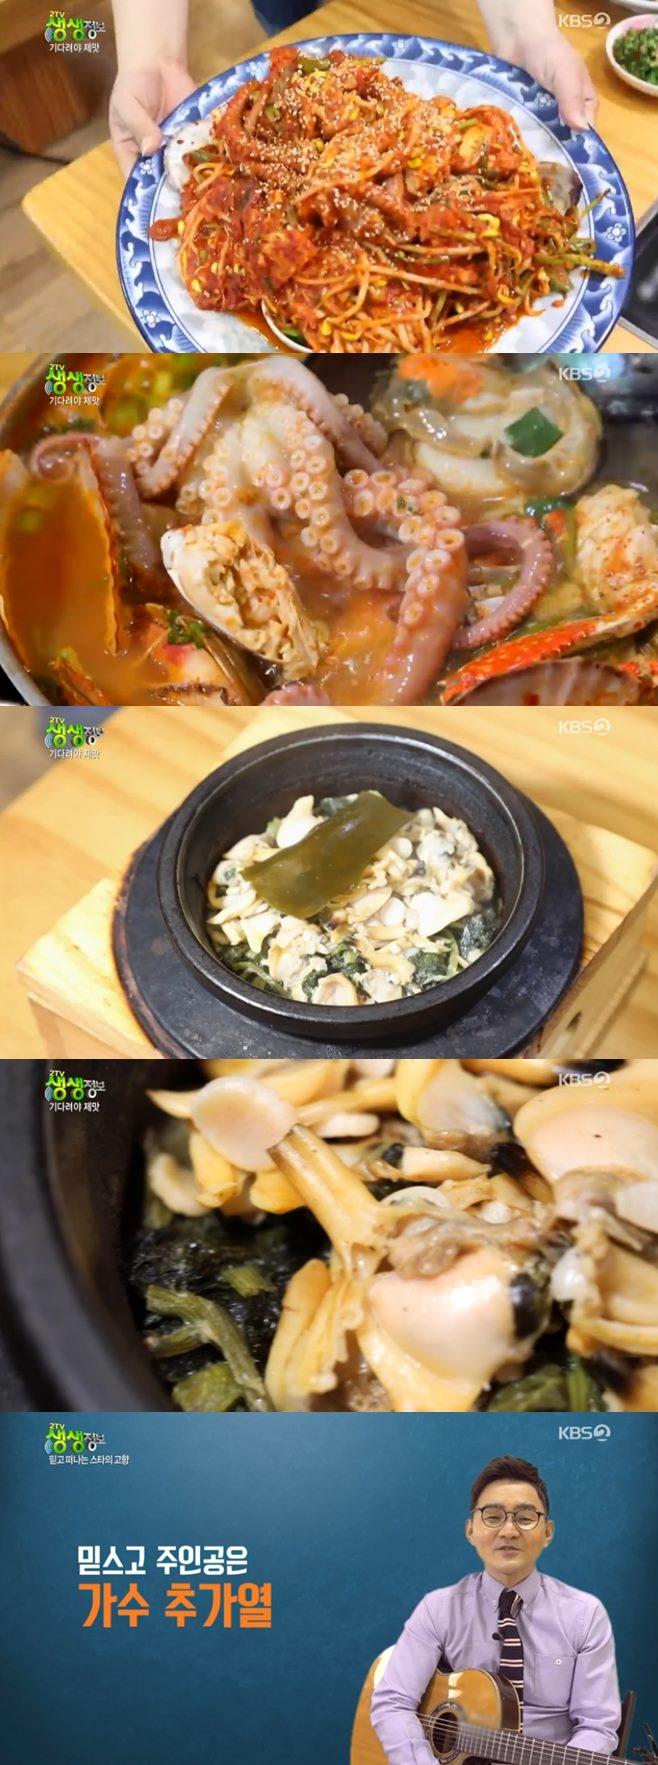 '2TV 생생정보' 가수 추가열 나이 고향, 보령 붕장어요리(벌떡아나고)vs바지락곤드레솥밥(해물로)맛집